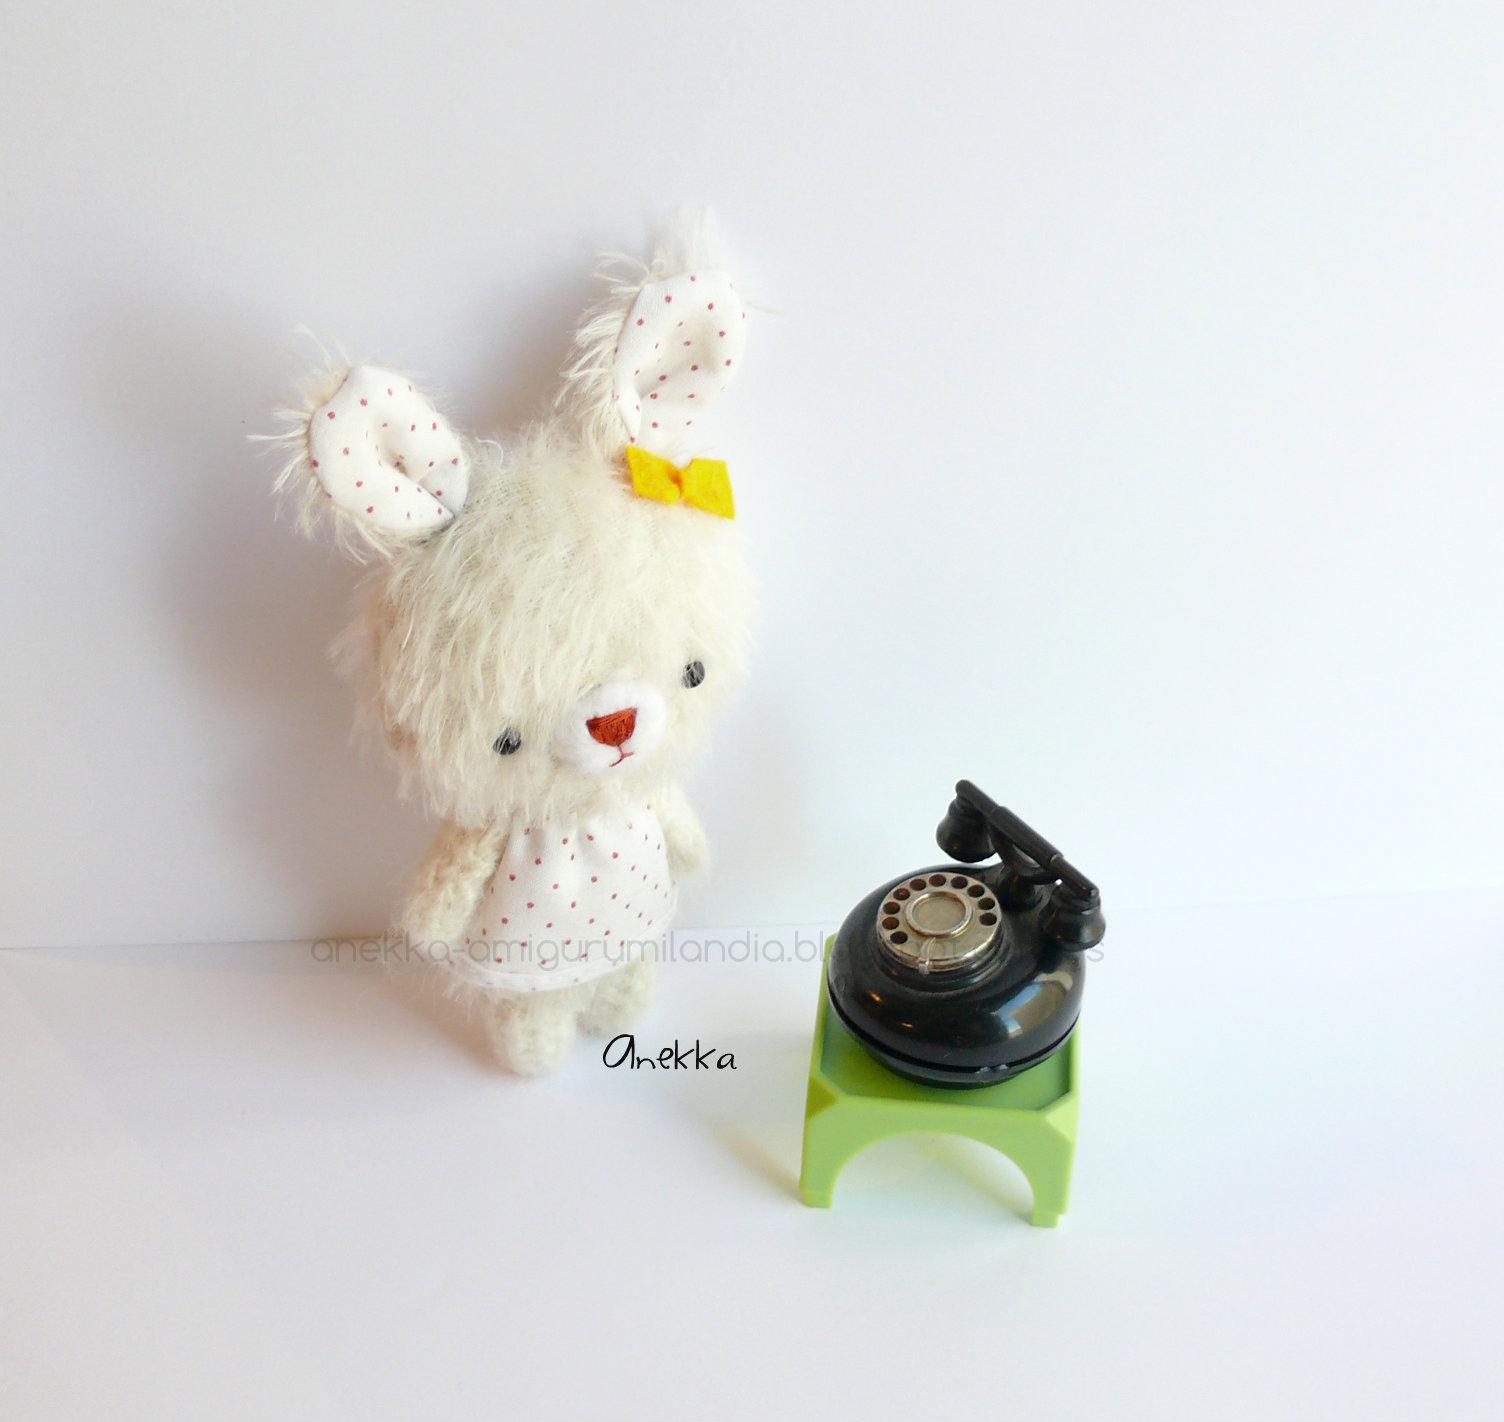 conejo peluche de mohair anekka handmade